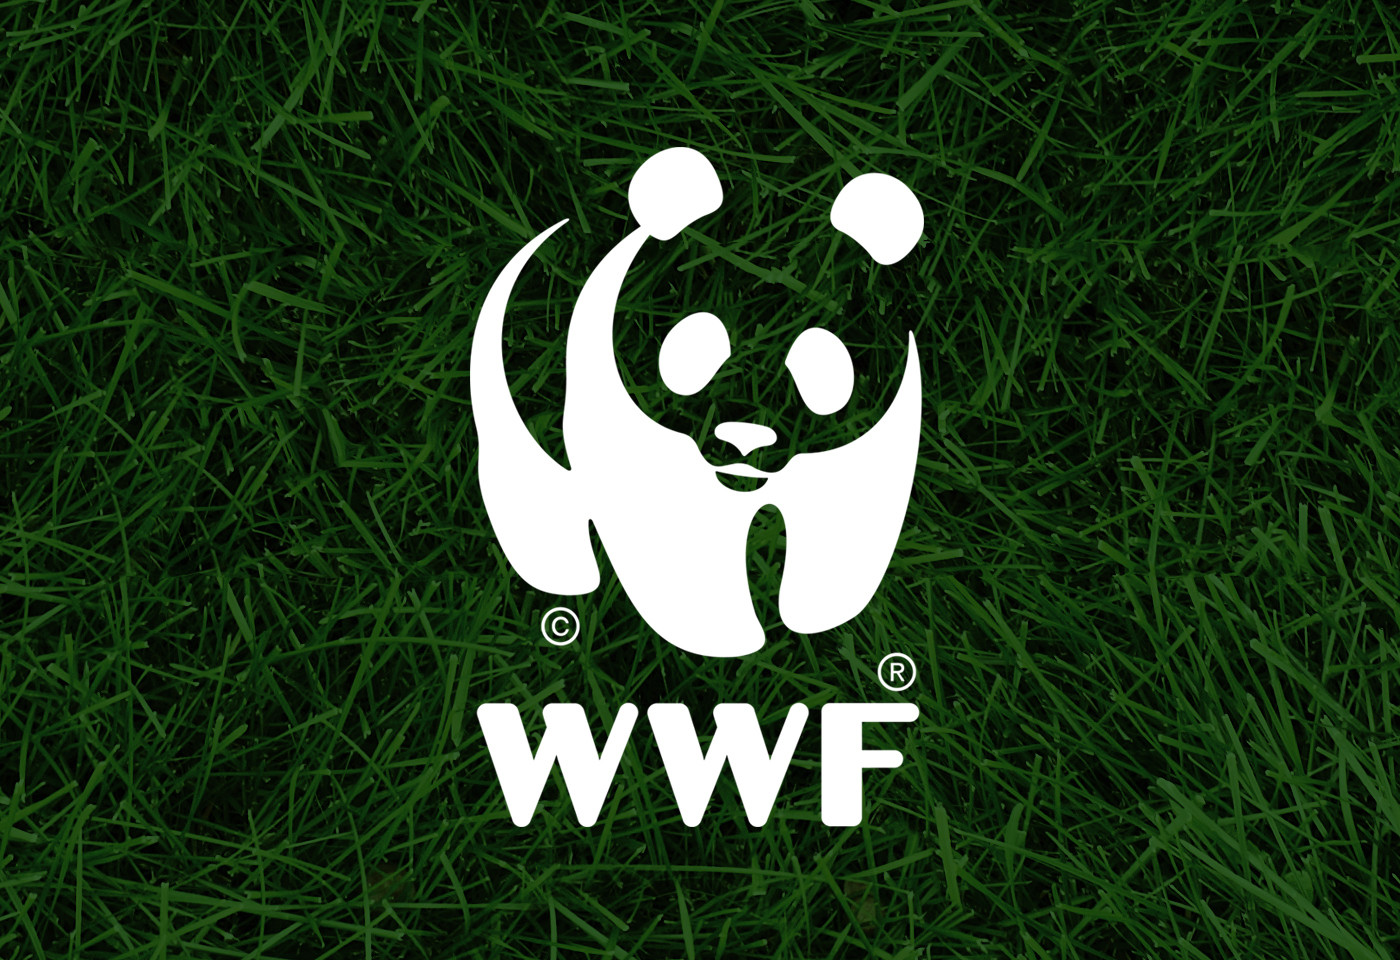 WWF Scotland